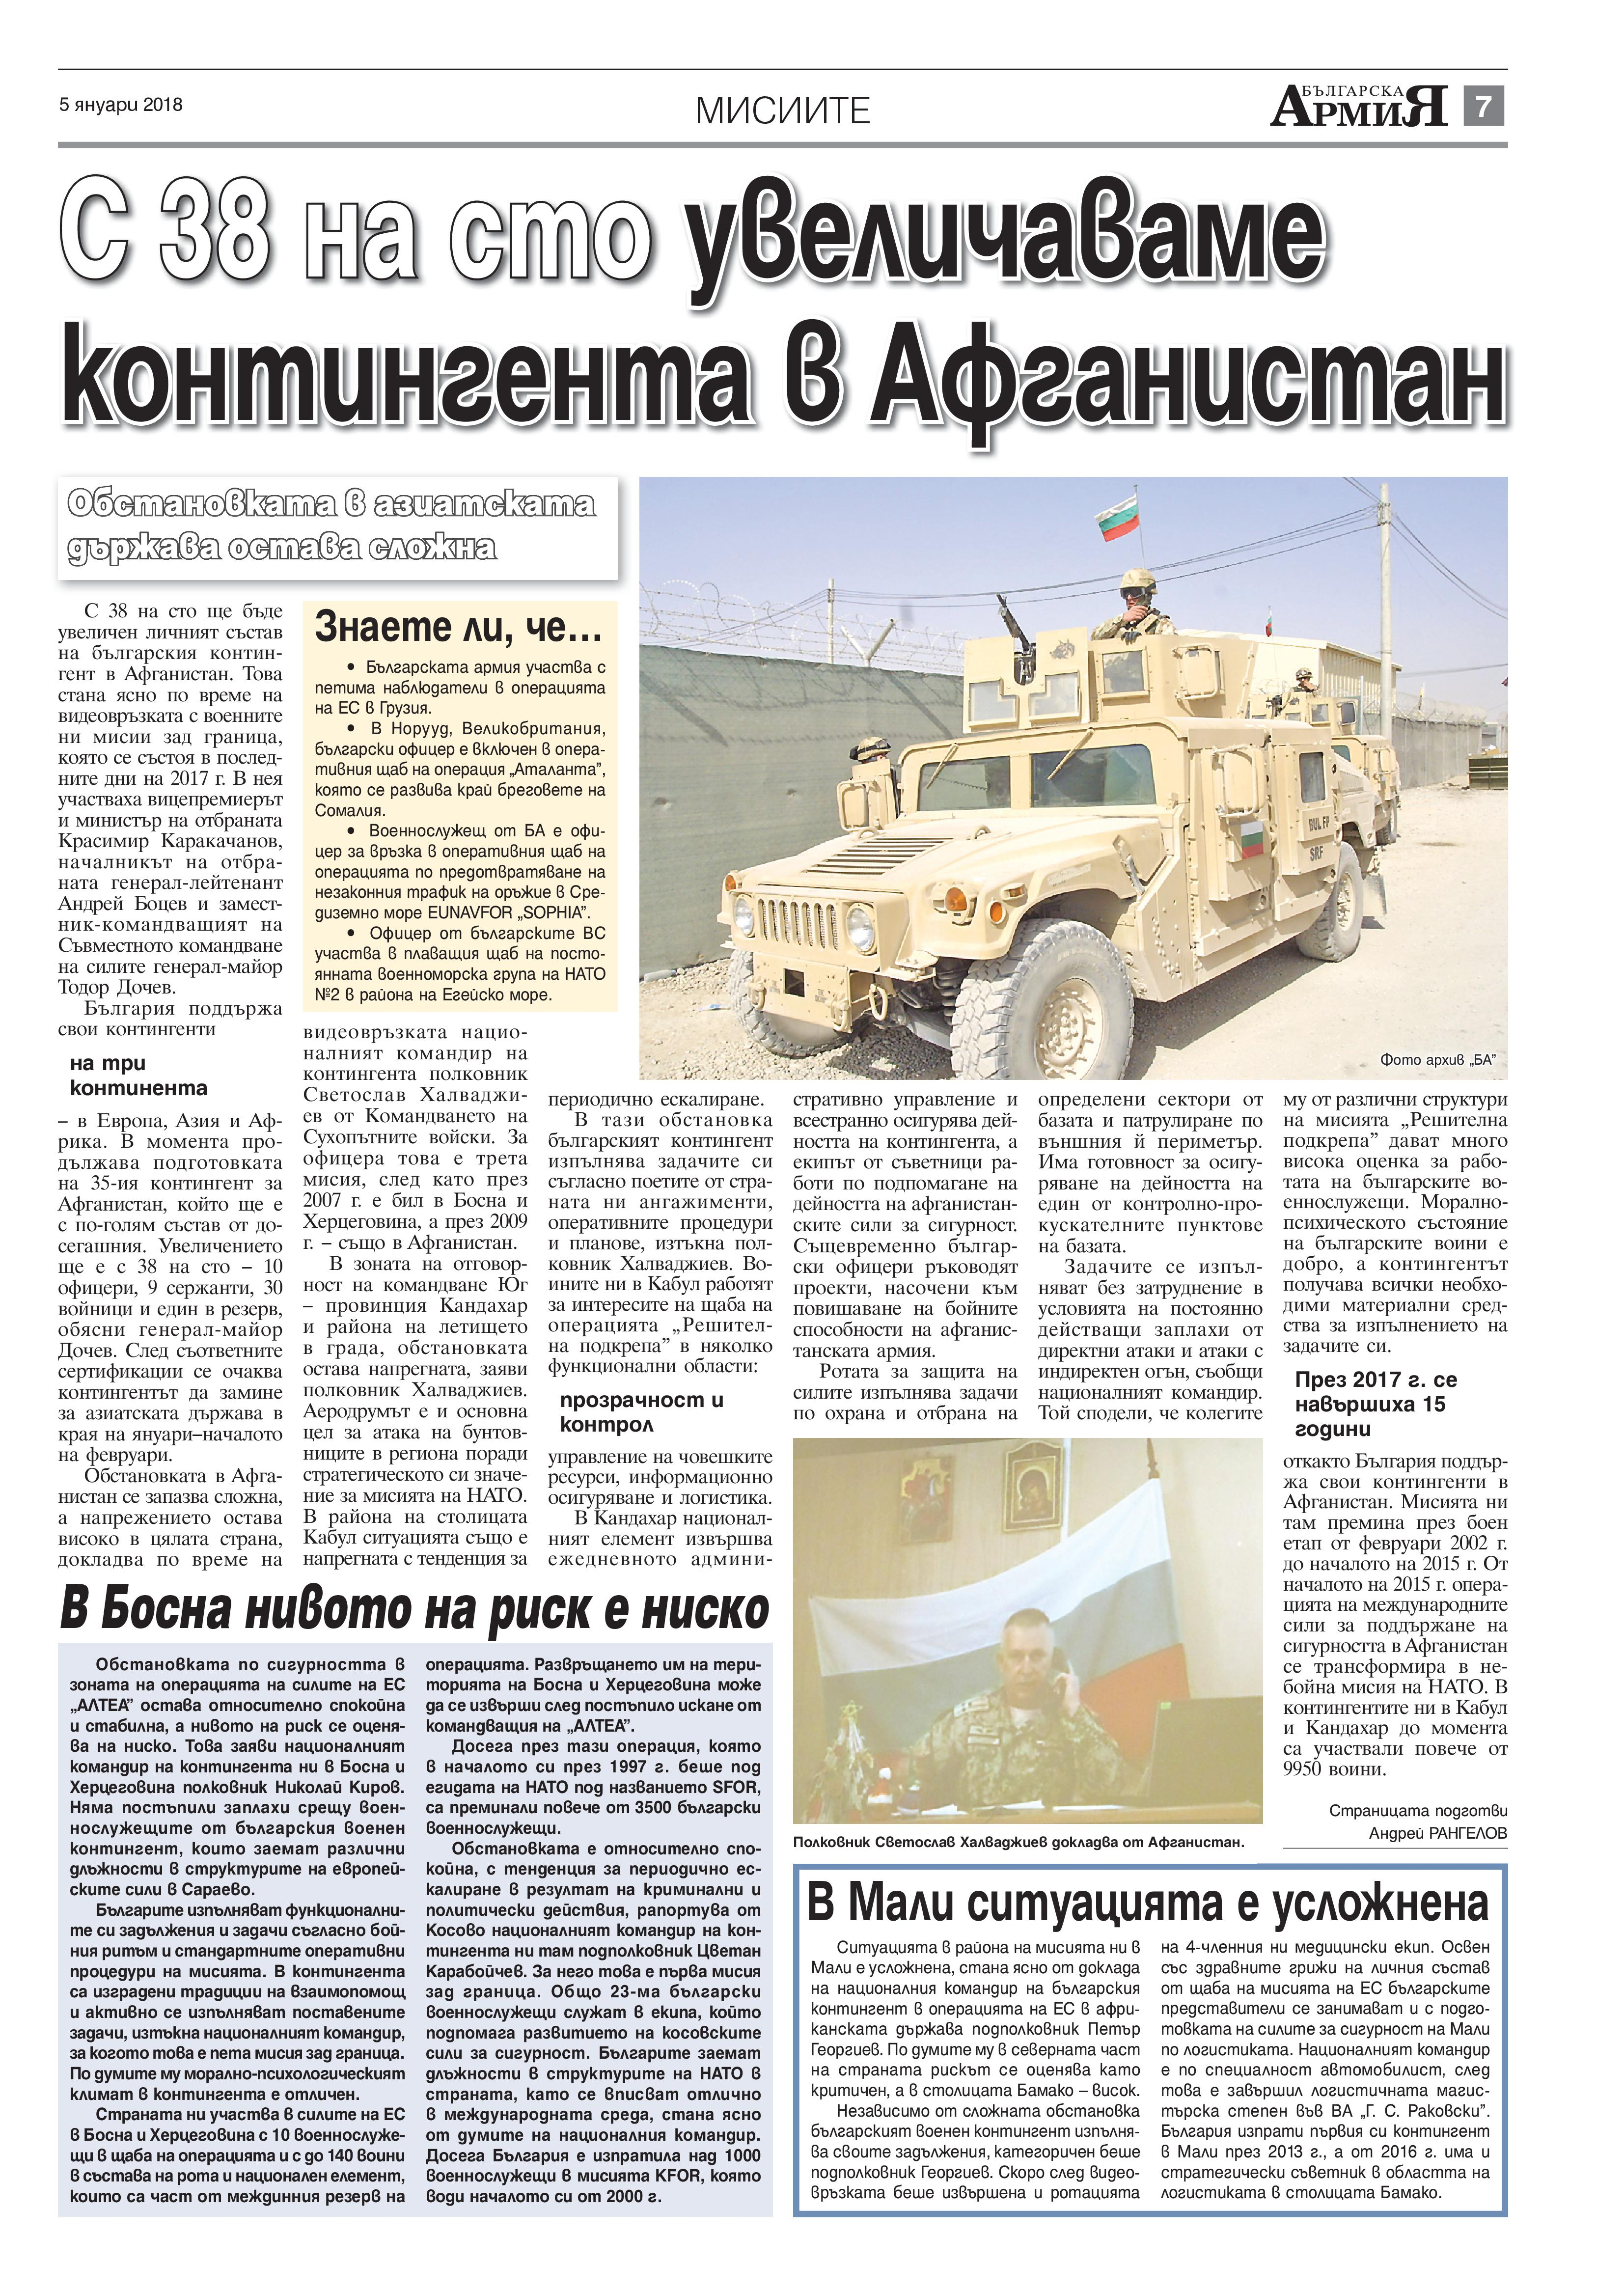 http://armymedia.bg/wp-content/uploads/2018/01/07.jpg